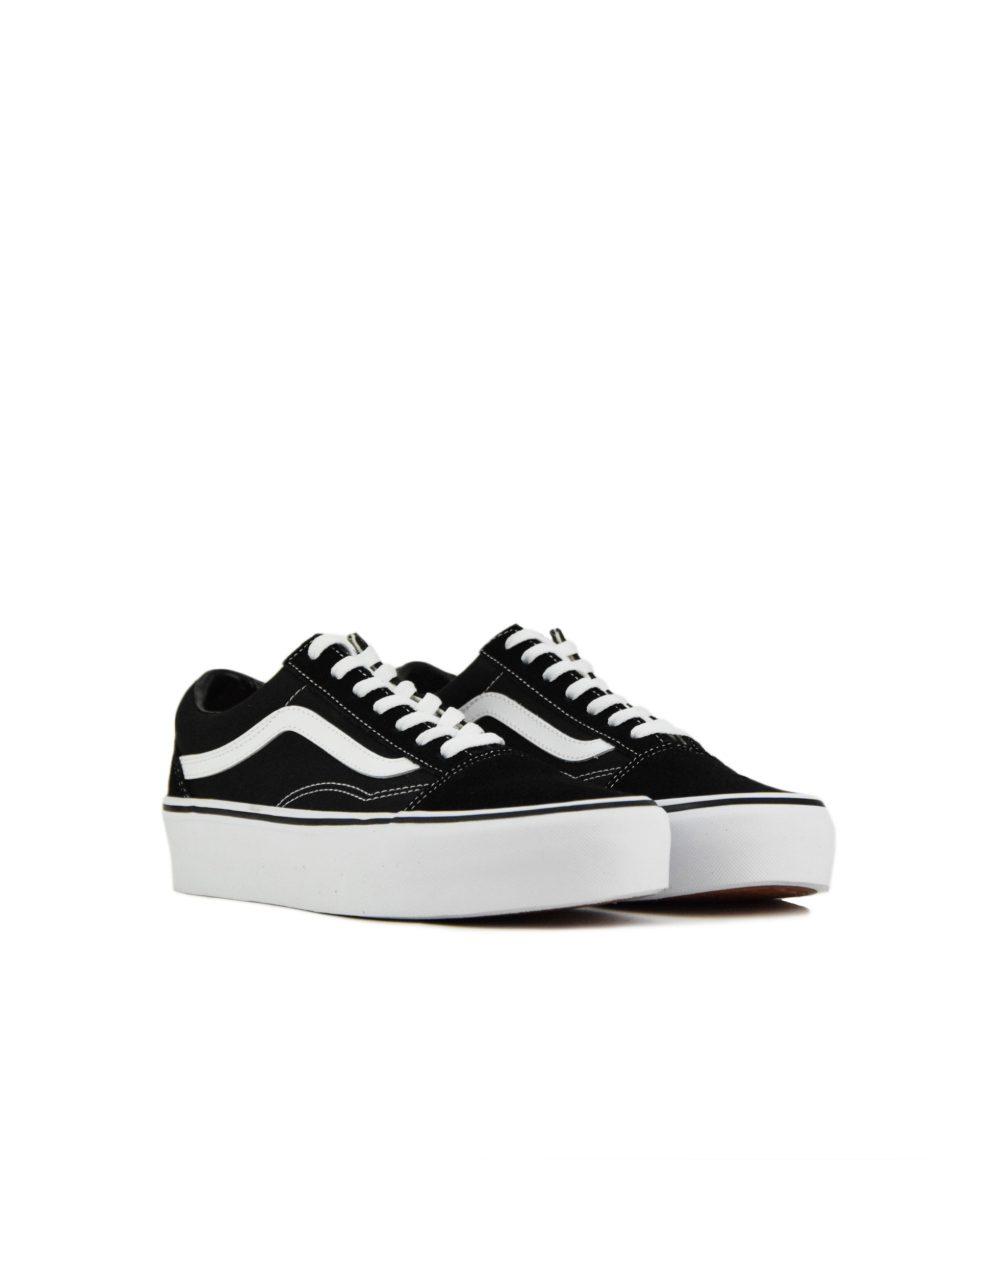 Vans Old Skool Platform (VN0A3B3UY281) Black/White